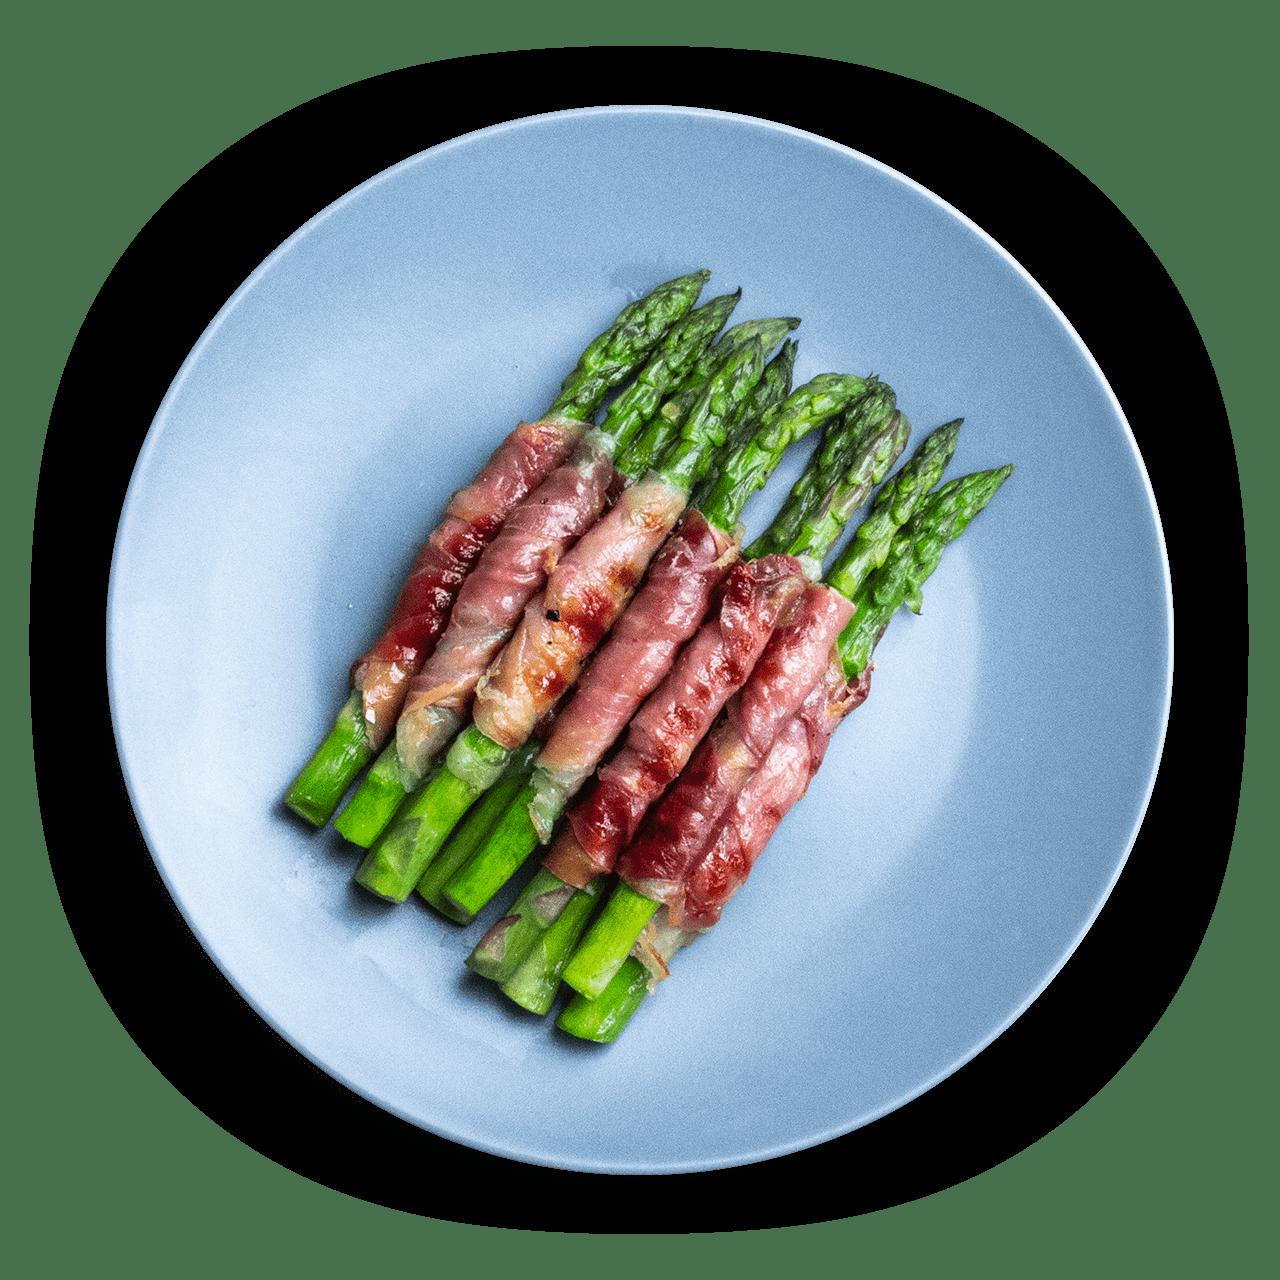 tostibanaan-asperges-serrano-ham